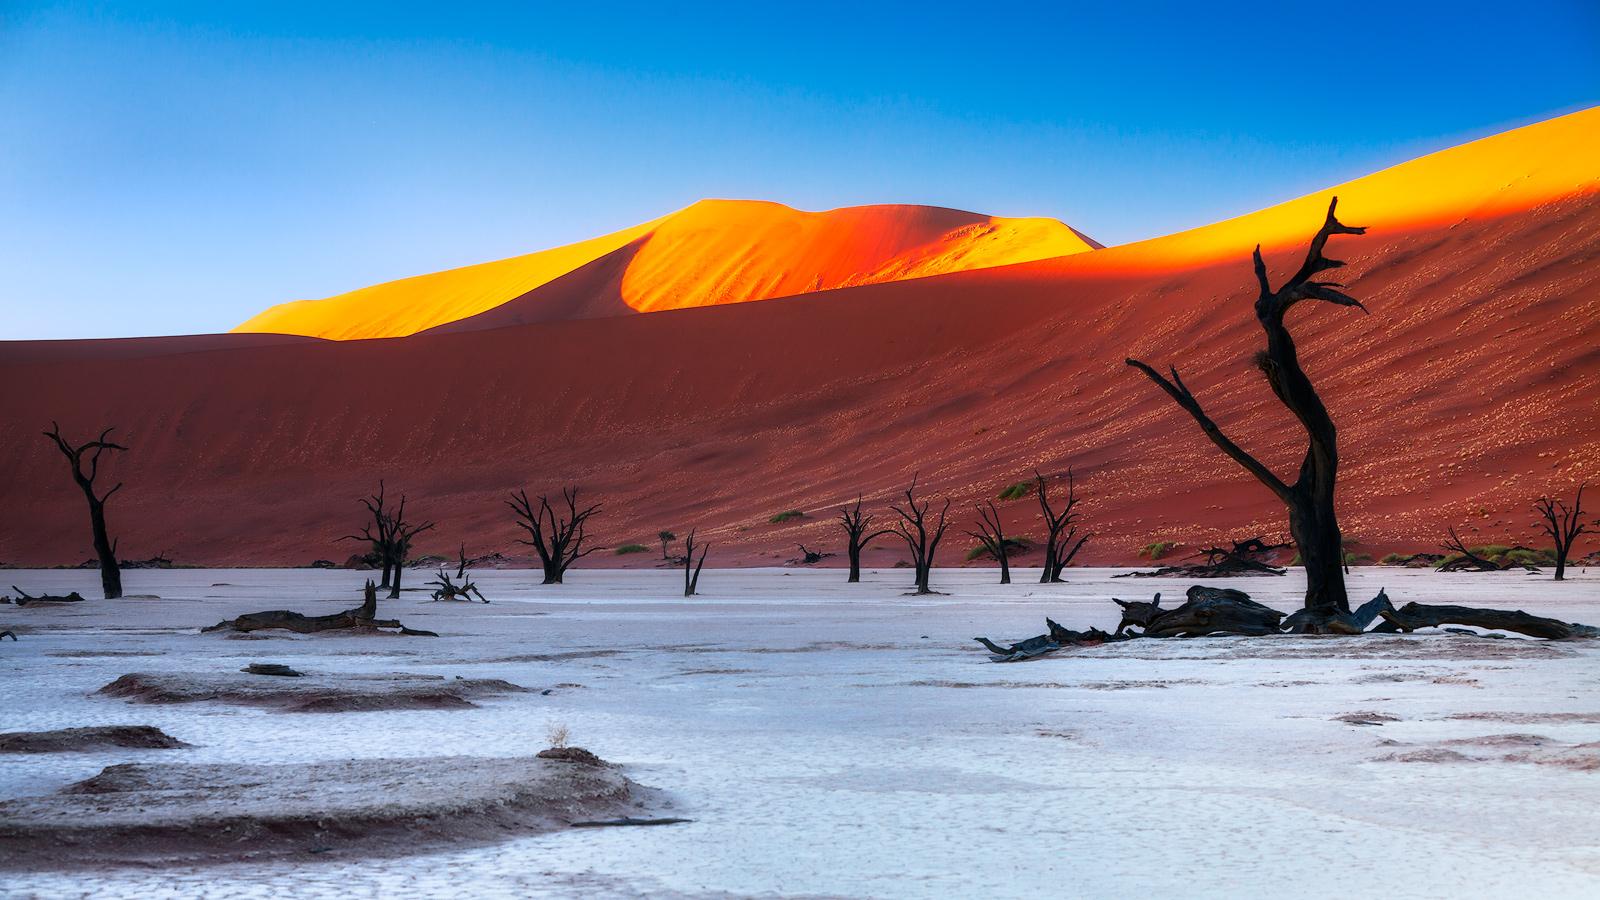 Tall Tree In Deadvlei Namibia Ken Koskela Photography LLC